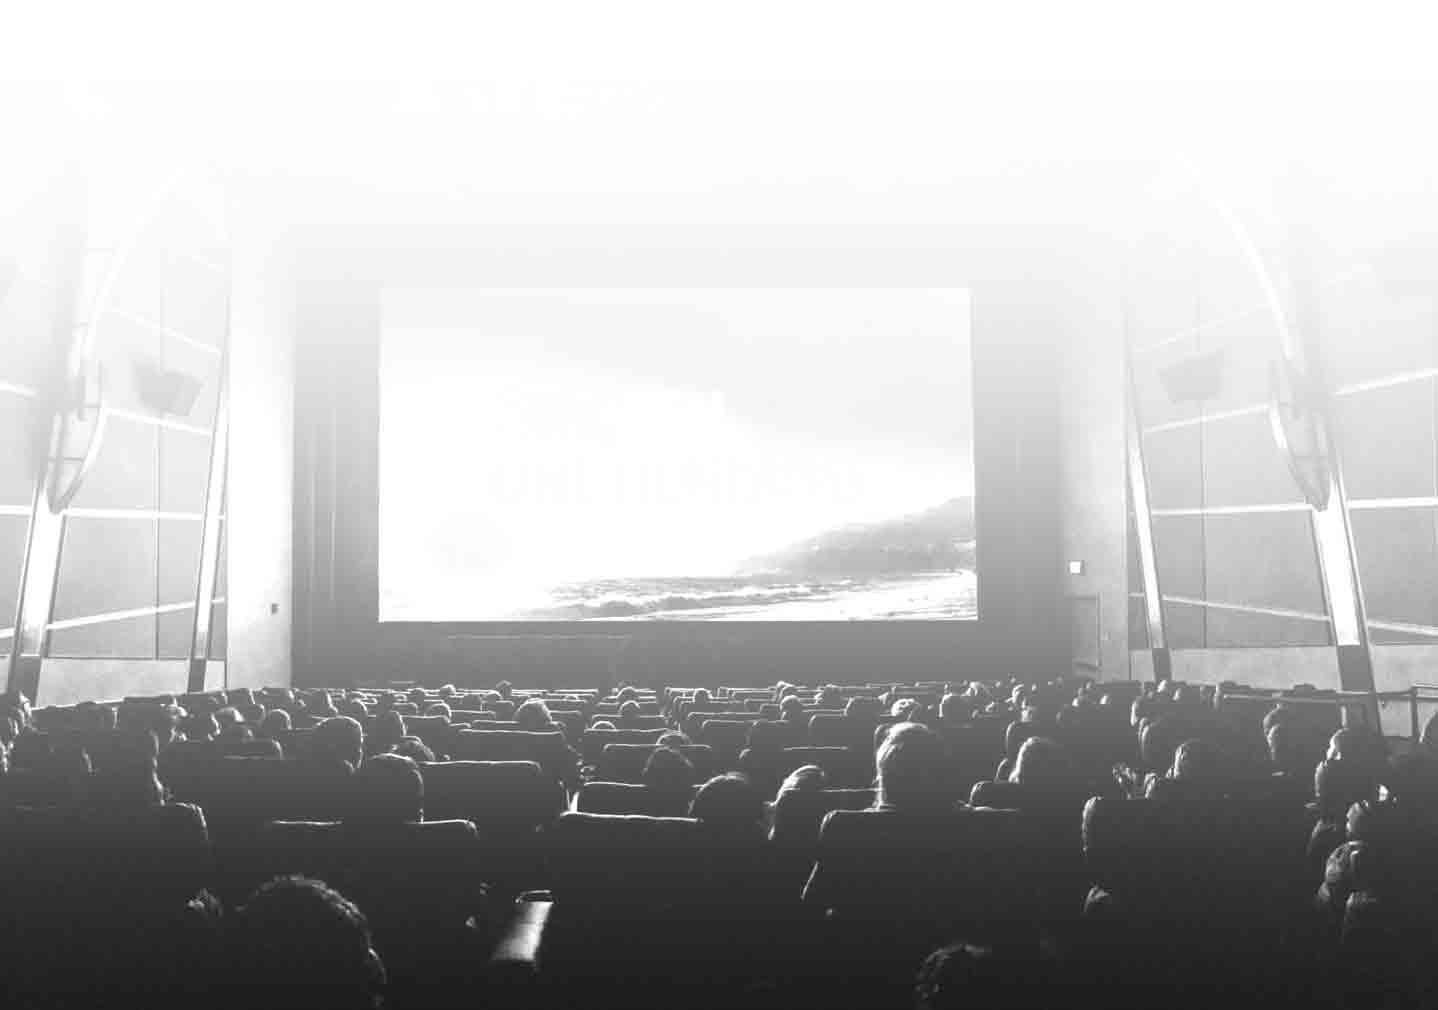 Auditorium full of people facing a movie screen